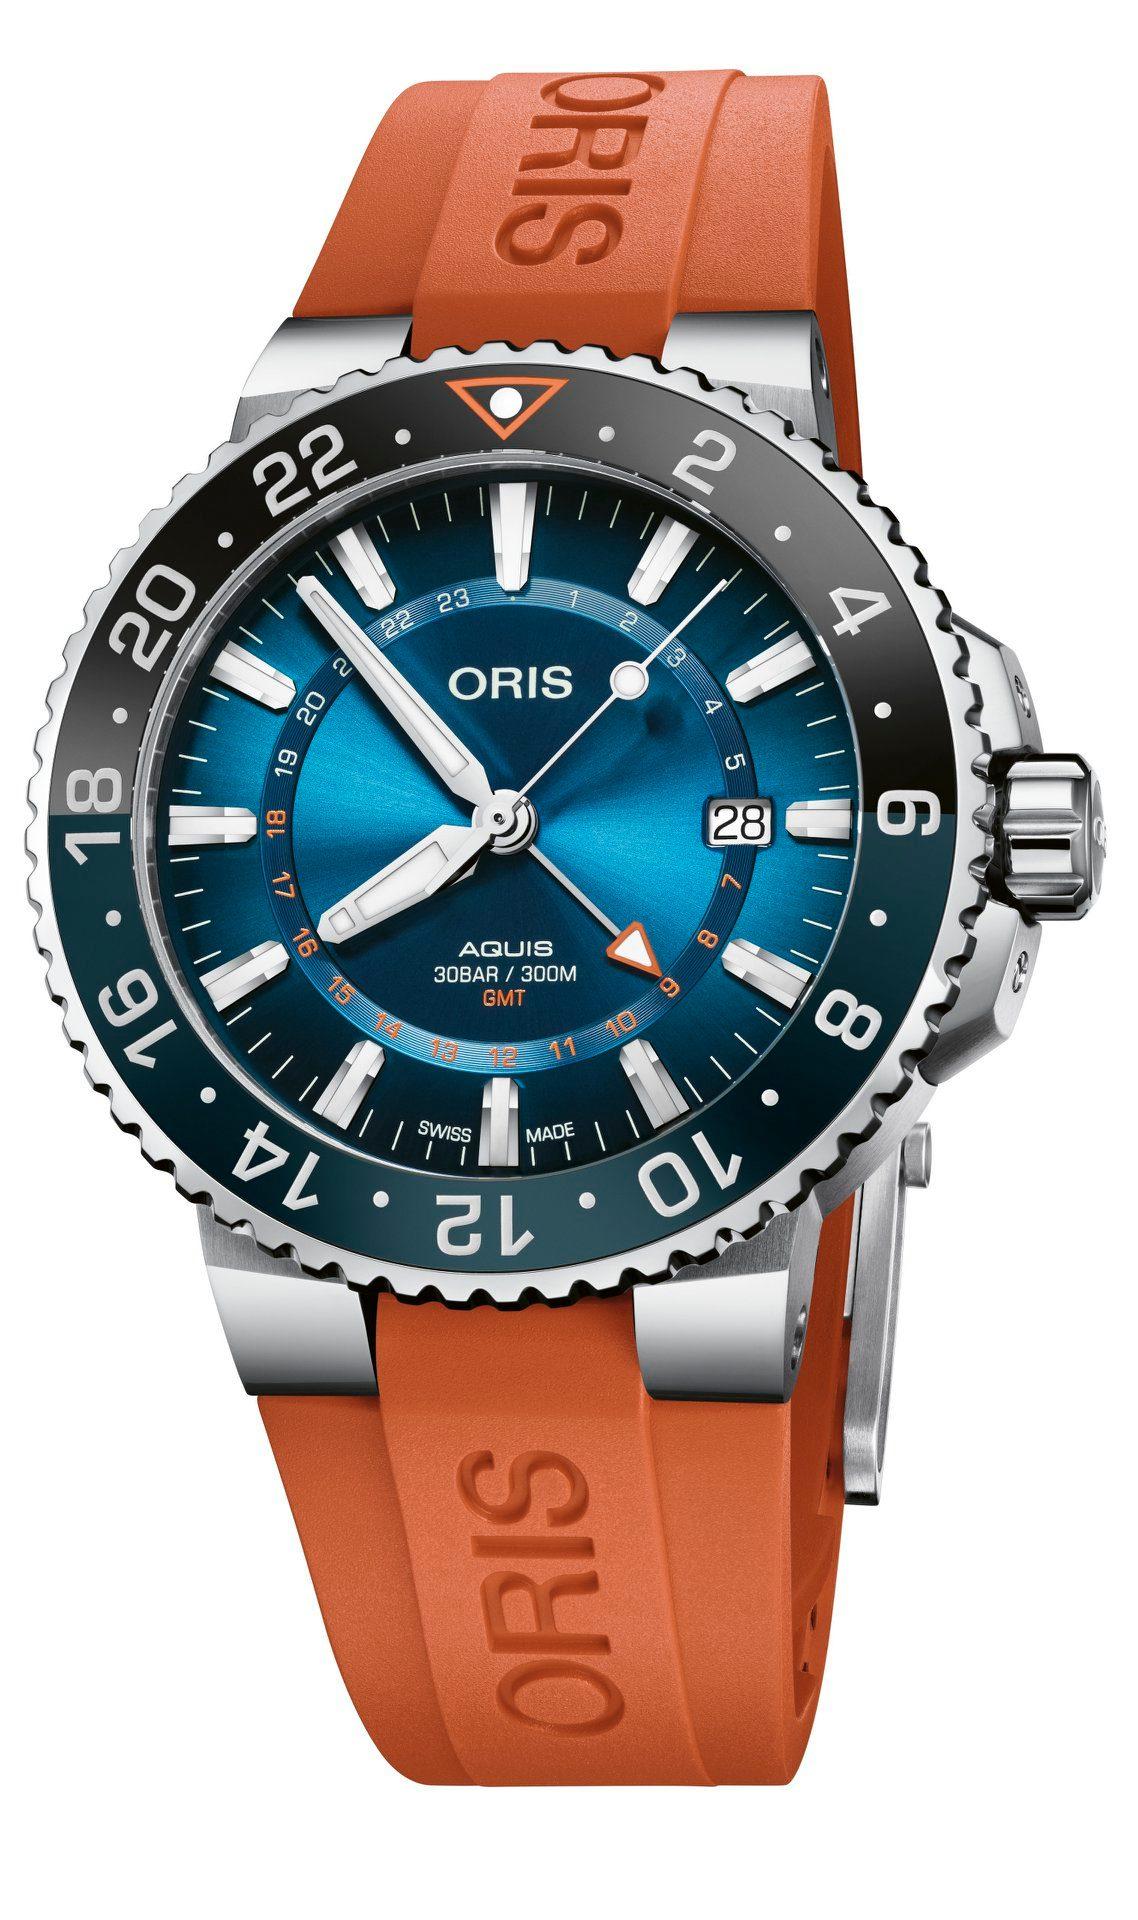 Oris Aquis Carysfort Reef Limited Edition-pack correa naranja